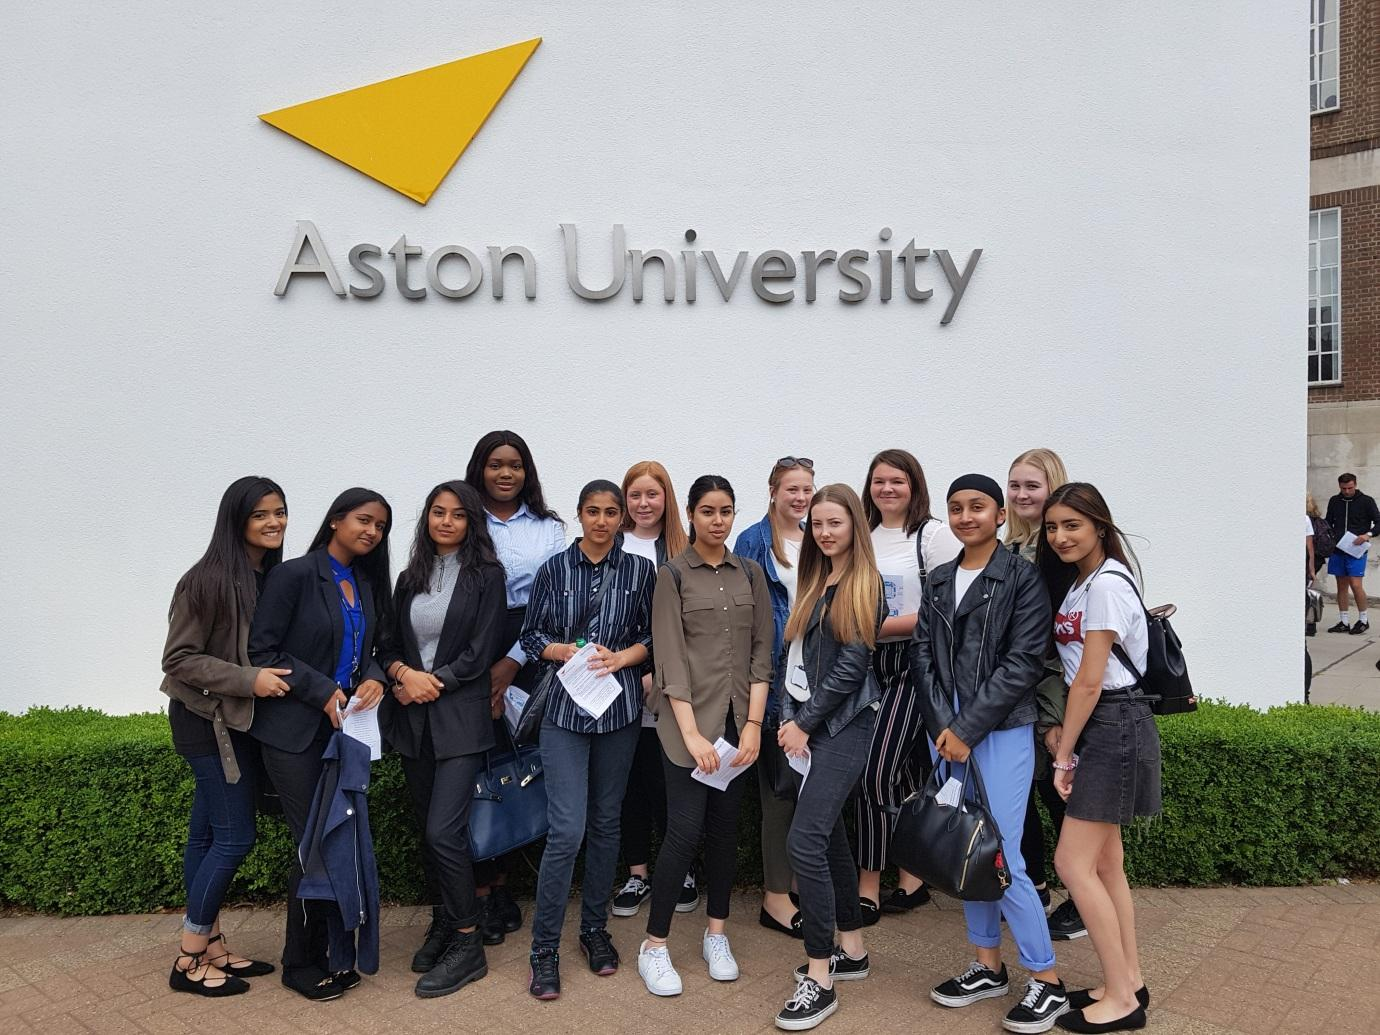 aston university 2.png